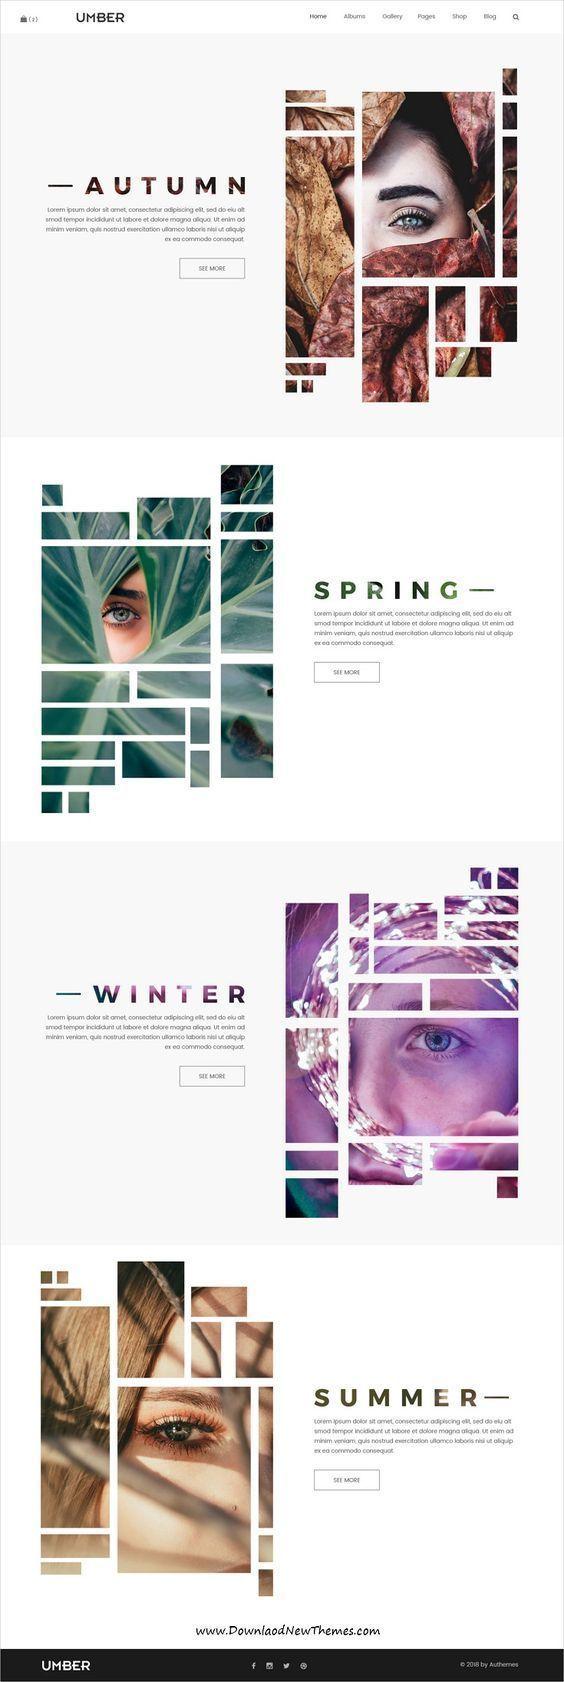 Katalog-Design-Services #KatalogDesignServices